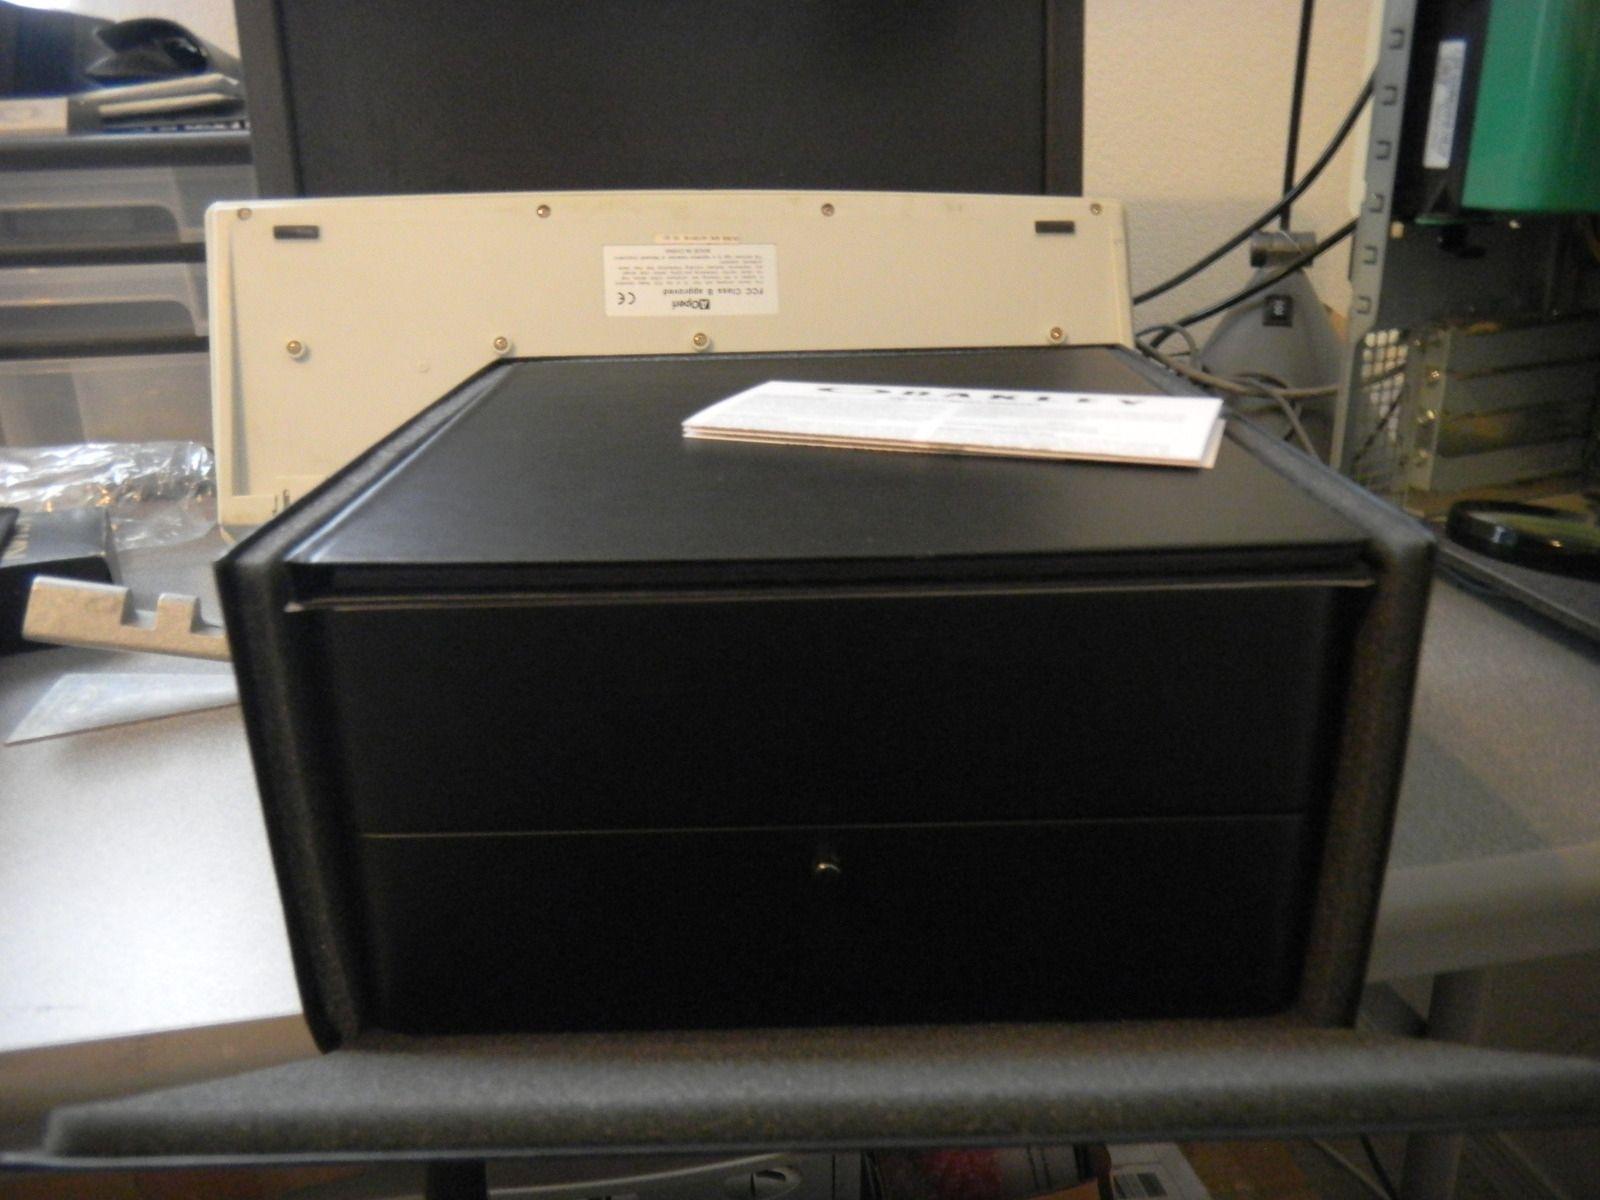 New In Box Complete C SIX - DSCN1622.JPG